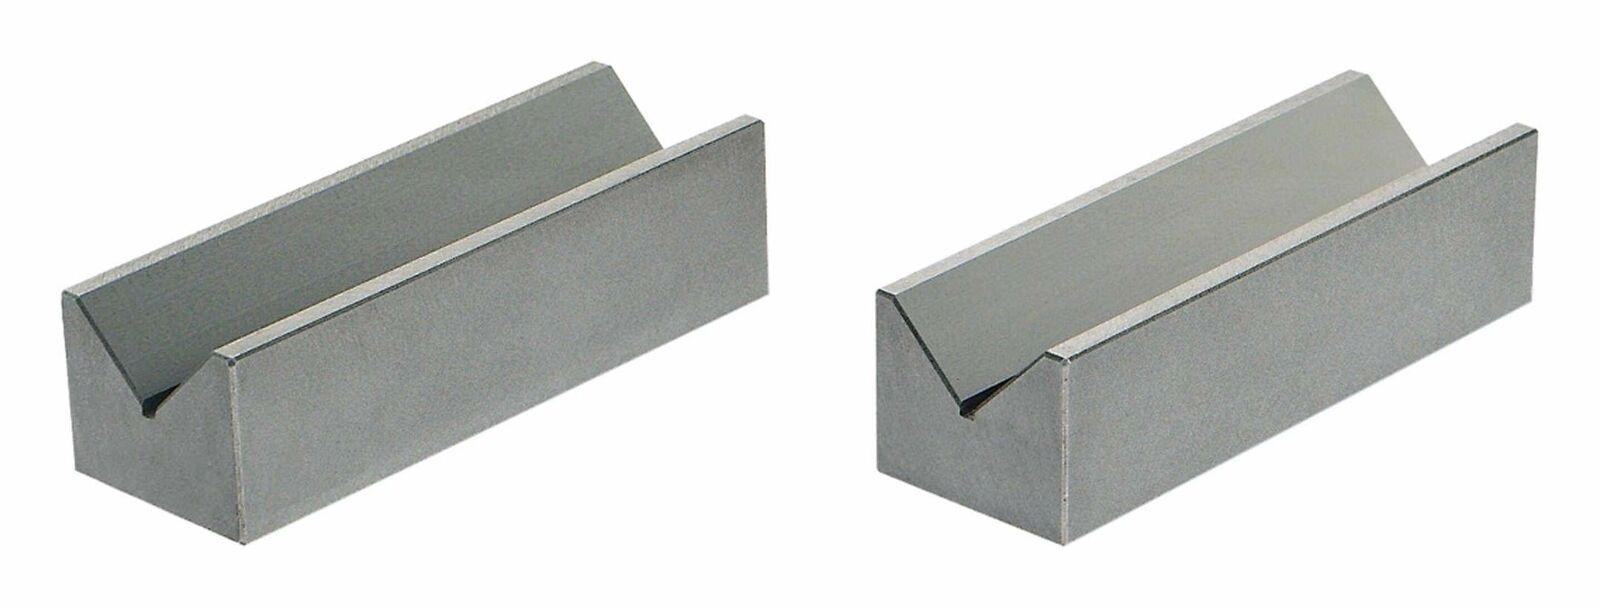 Helios Preisser Prismenpaar Güte 1 150 x 50 x 40mm - 0504113